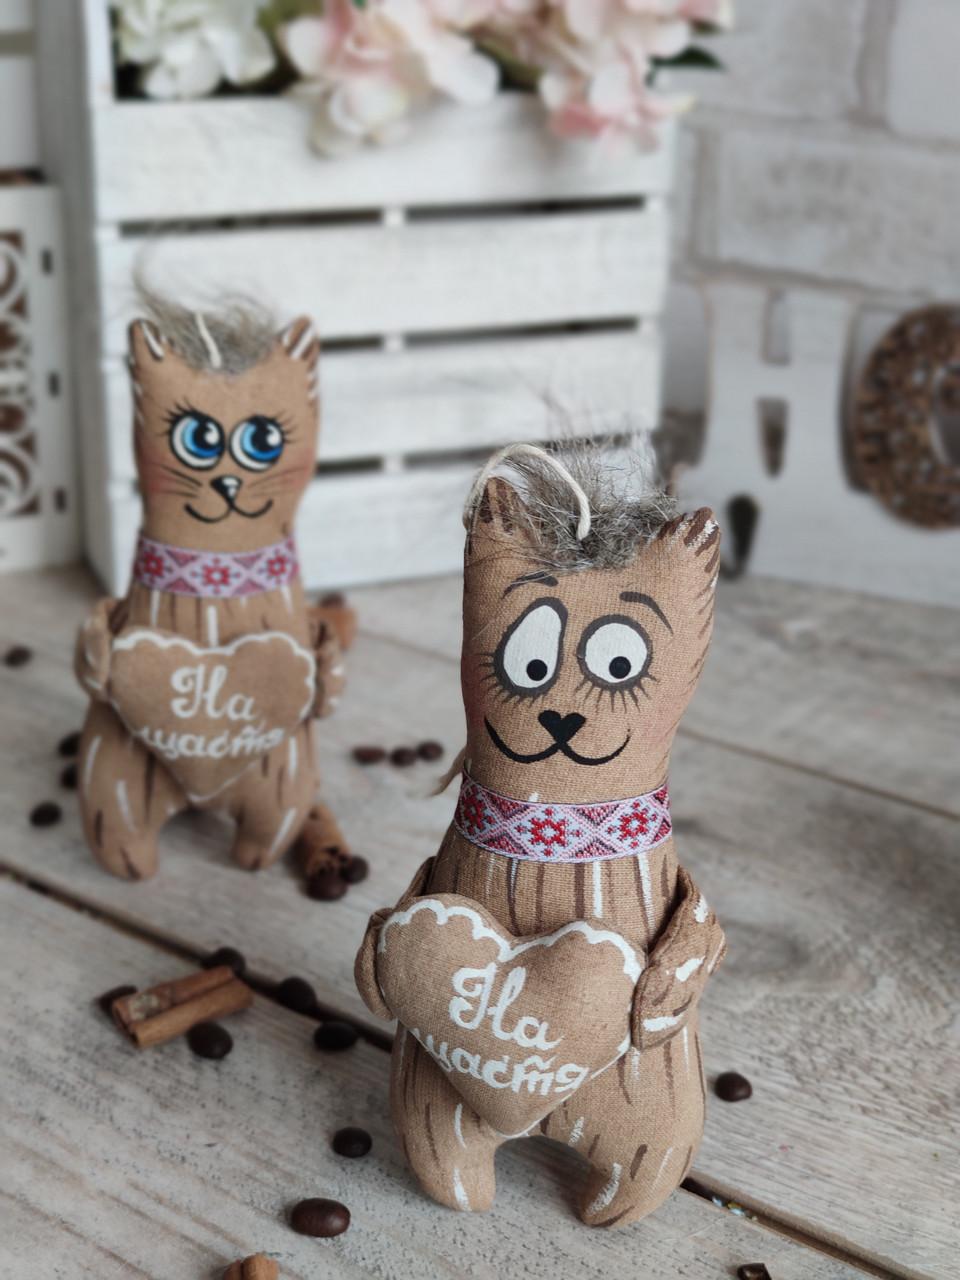 Кот с пожеланиями, кот кофе, какао, корица, 16*9 см, 65/85 (цена за 1 кота. + 20 гр.)